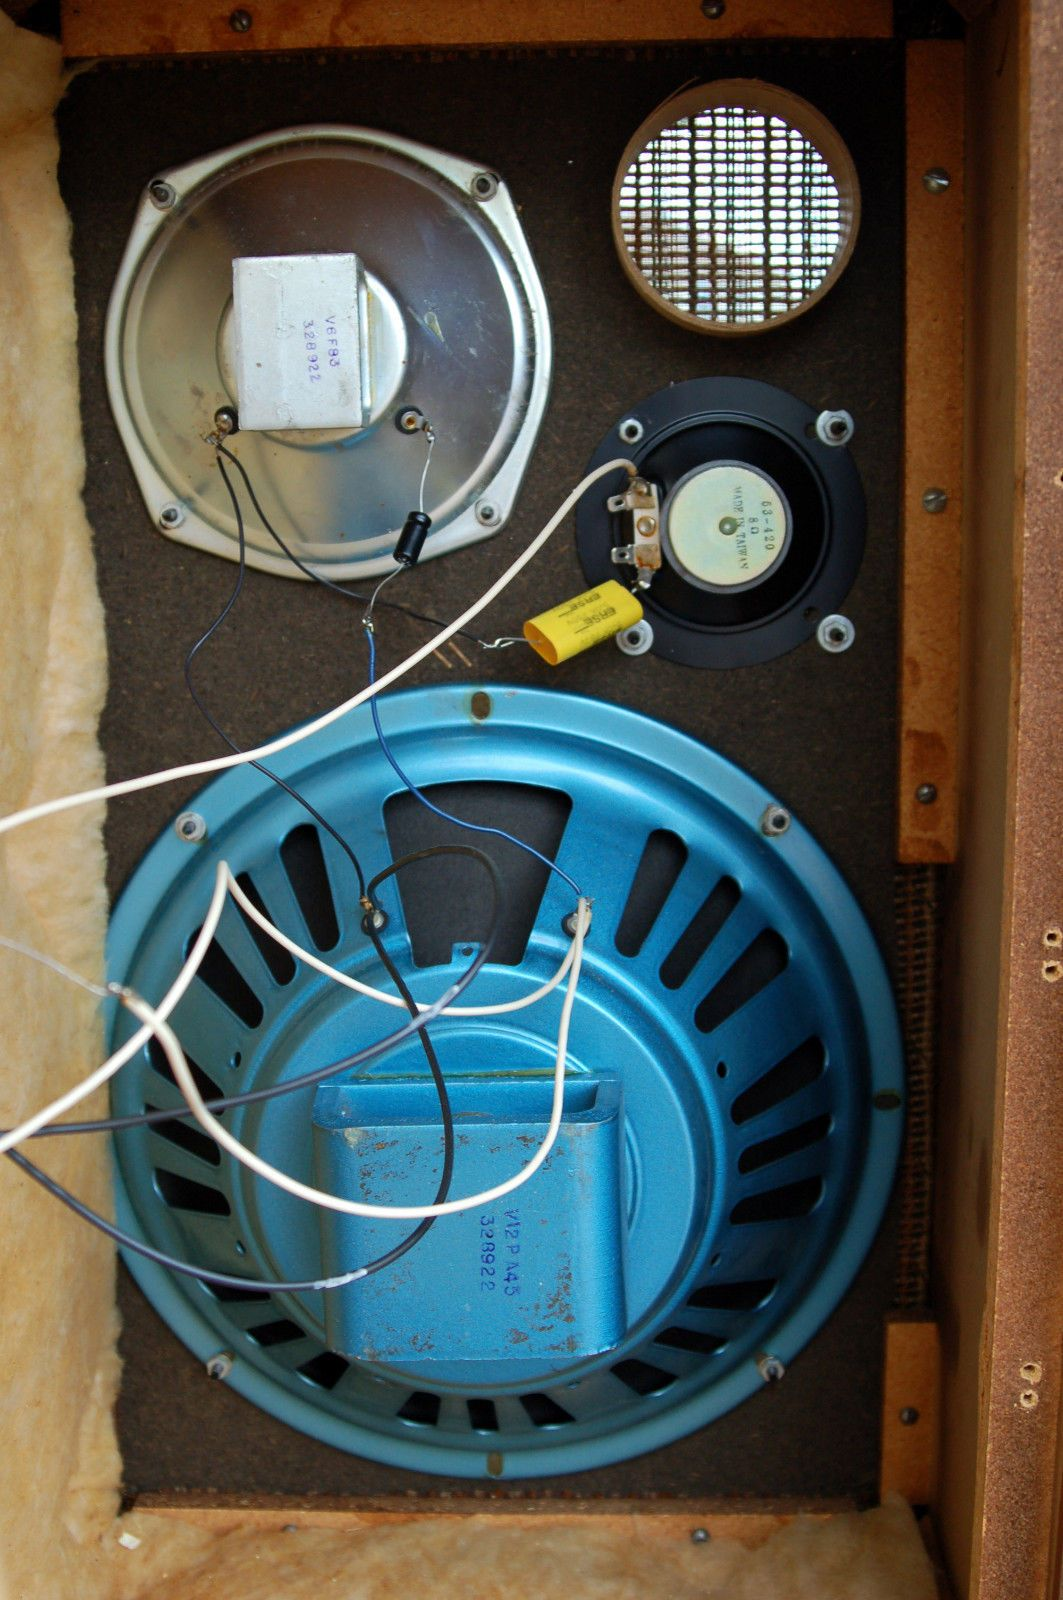 vintage utah wd 66 12 3 way speaker system 8 ohms 30 watts made in usa ebay [ 1063 x 1600 Pixel ]